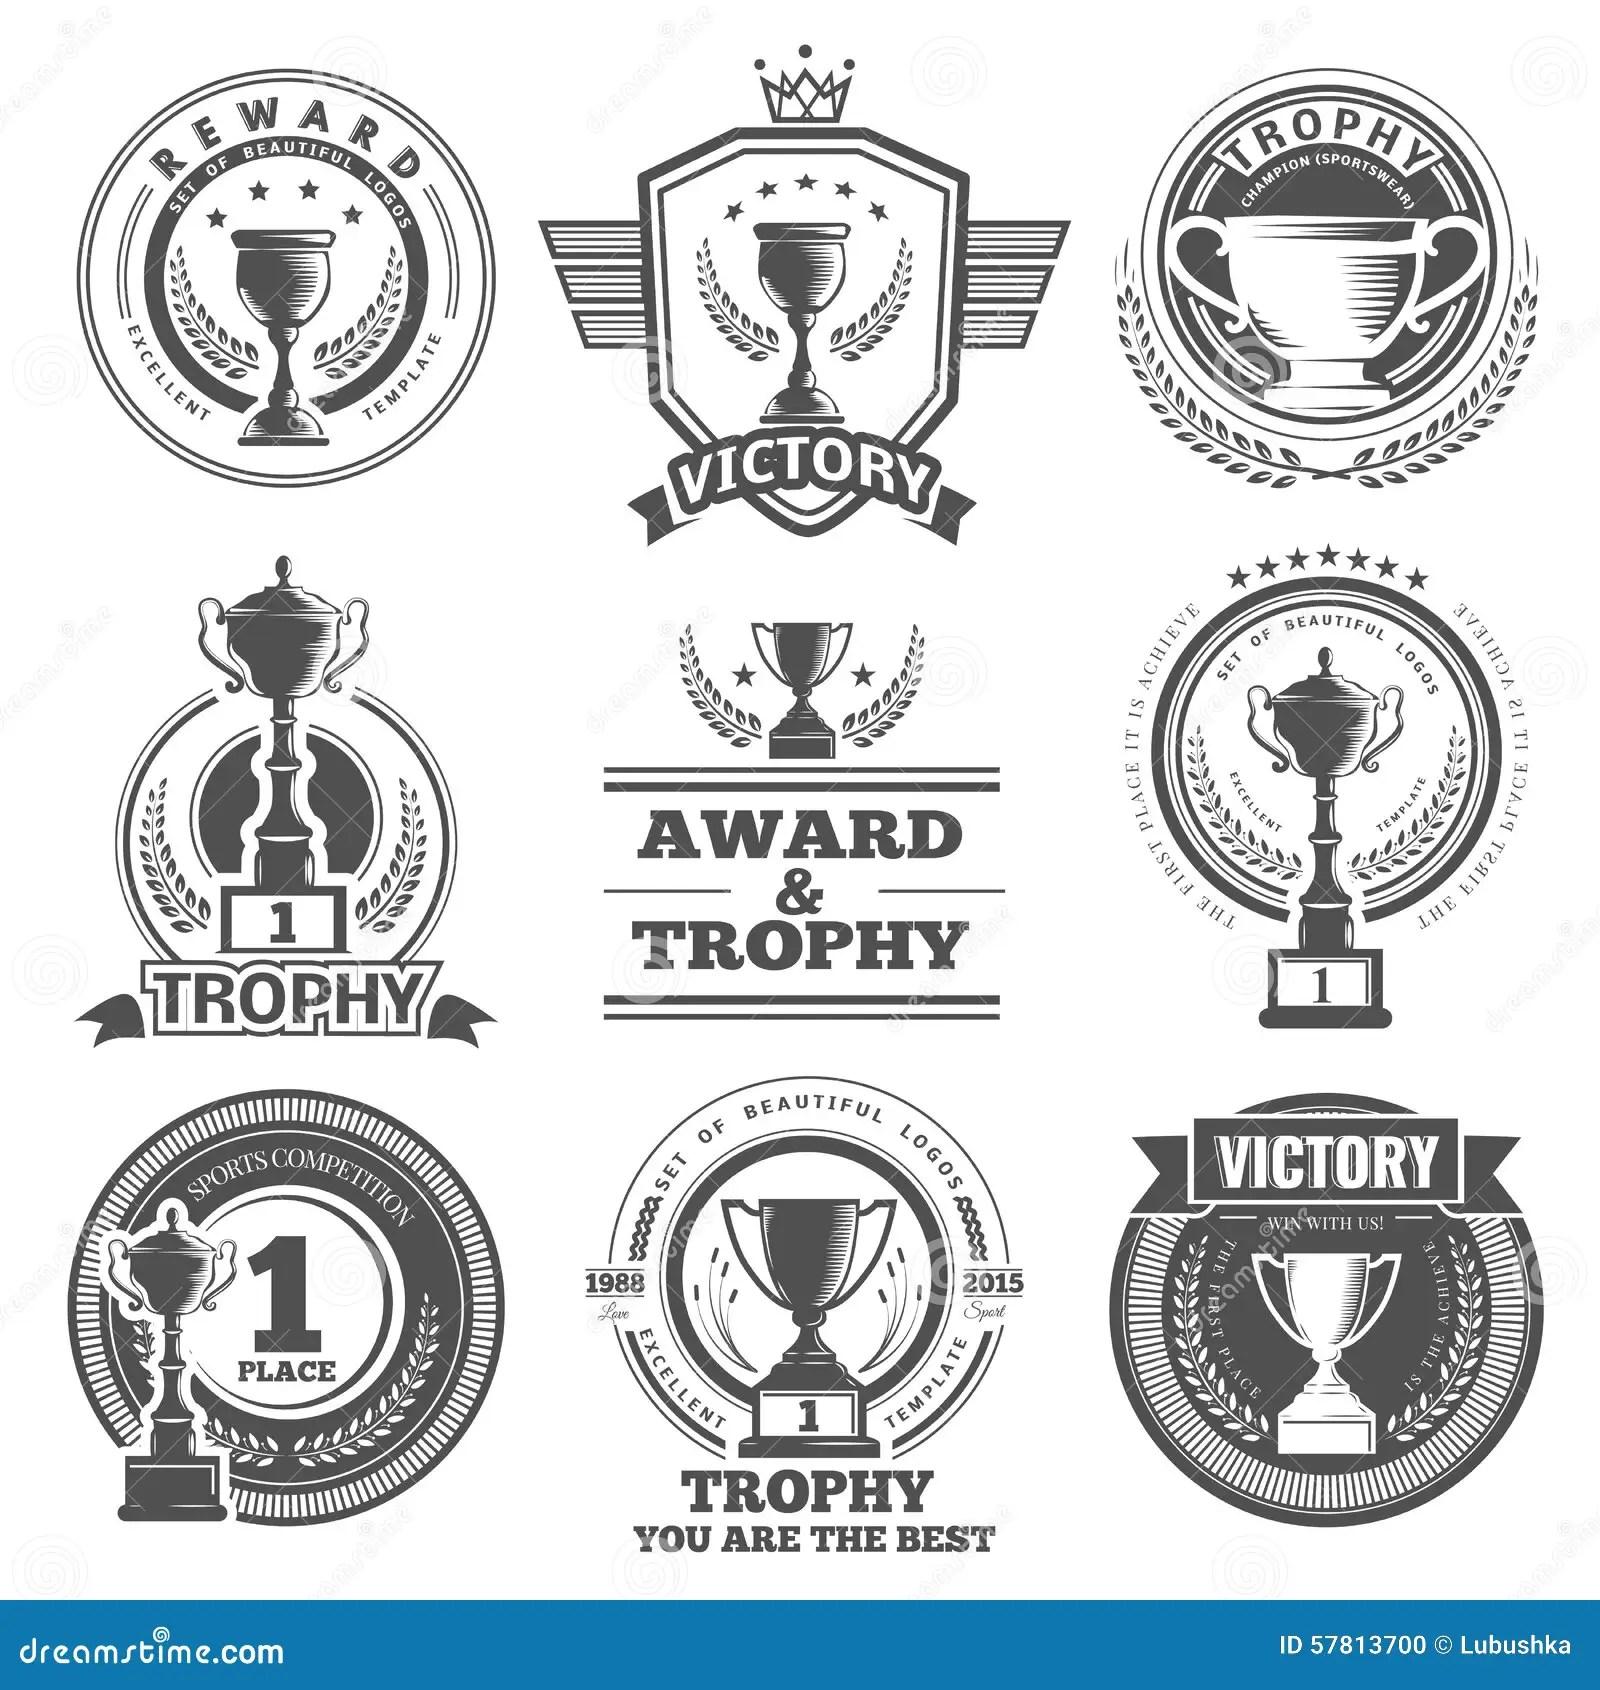 Vector winner logos stock vector. Illustration of badge